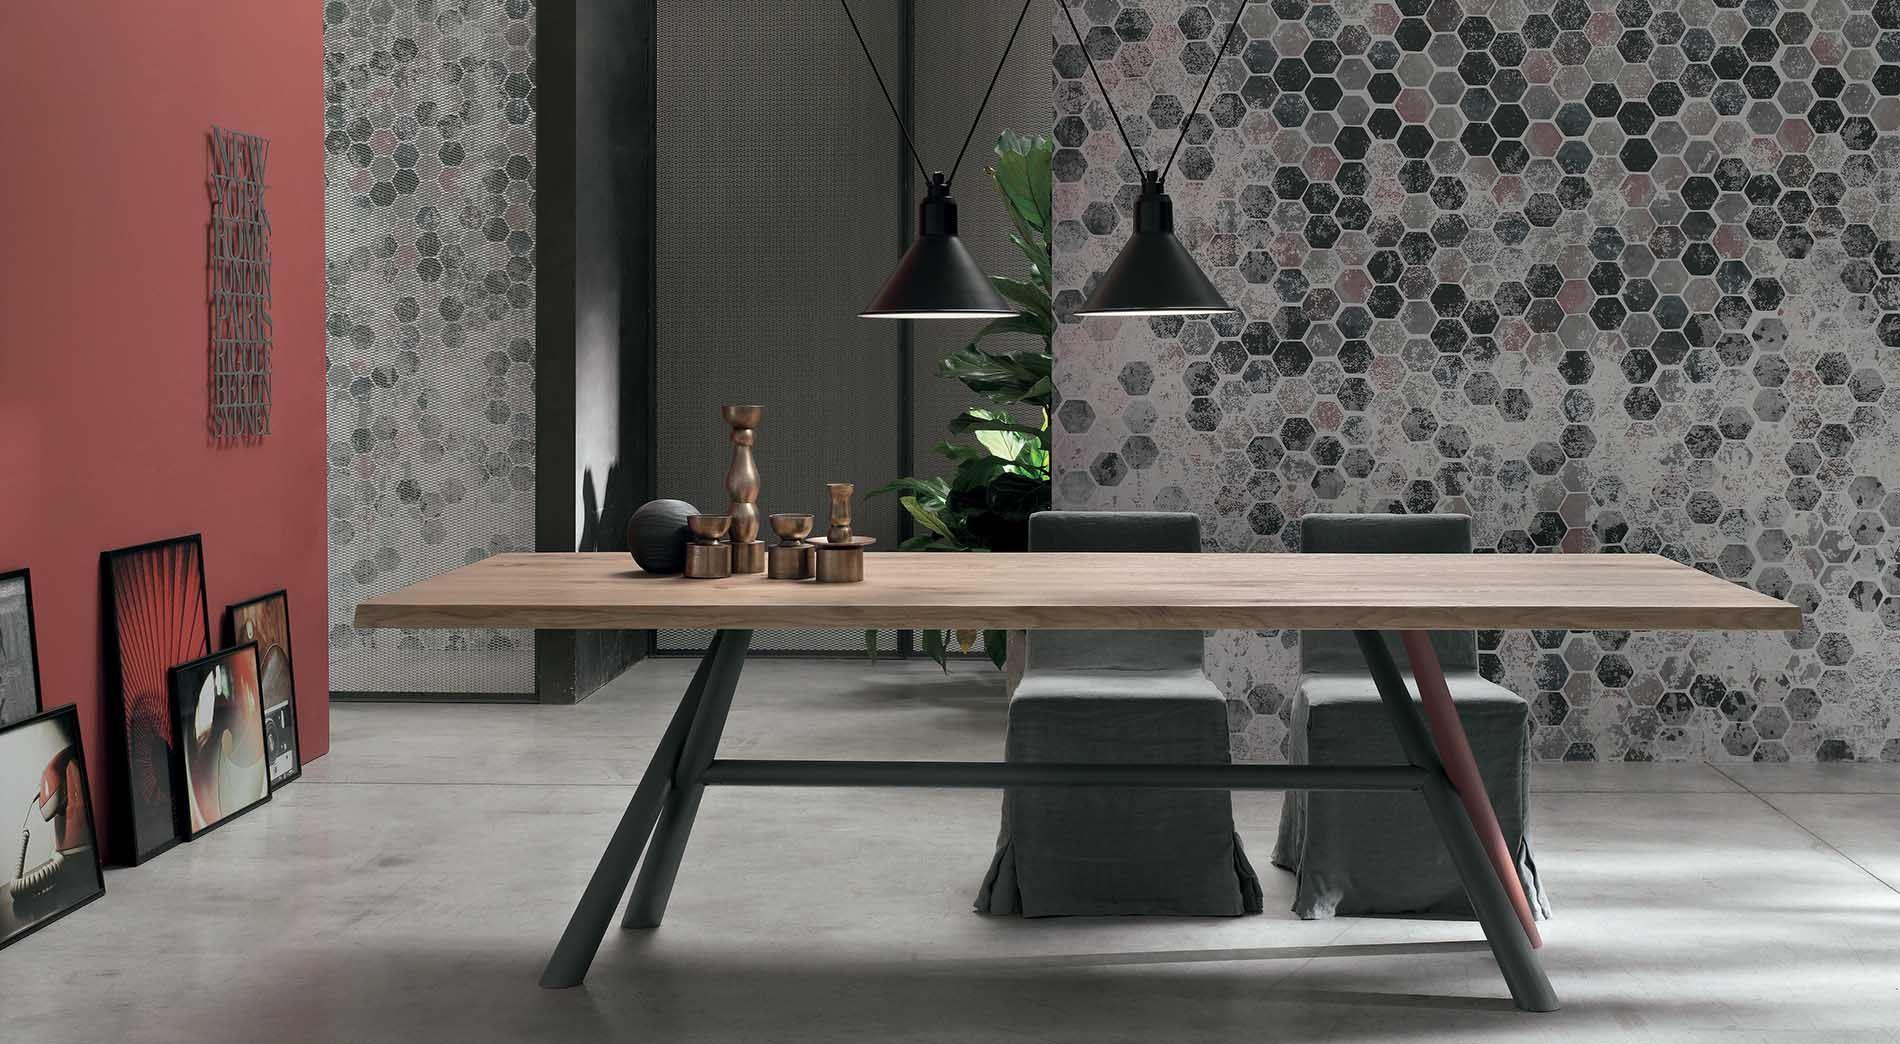 Outlet tavoli design a padova tavoli allungabili tavoli for Tavoli di design outlet